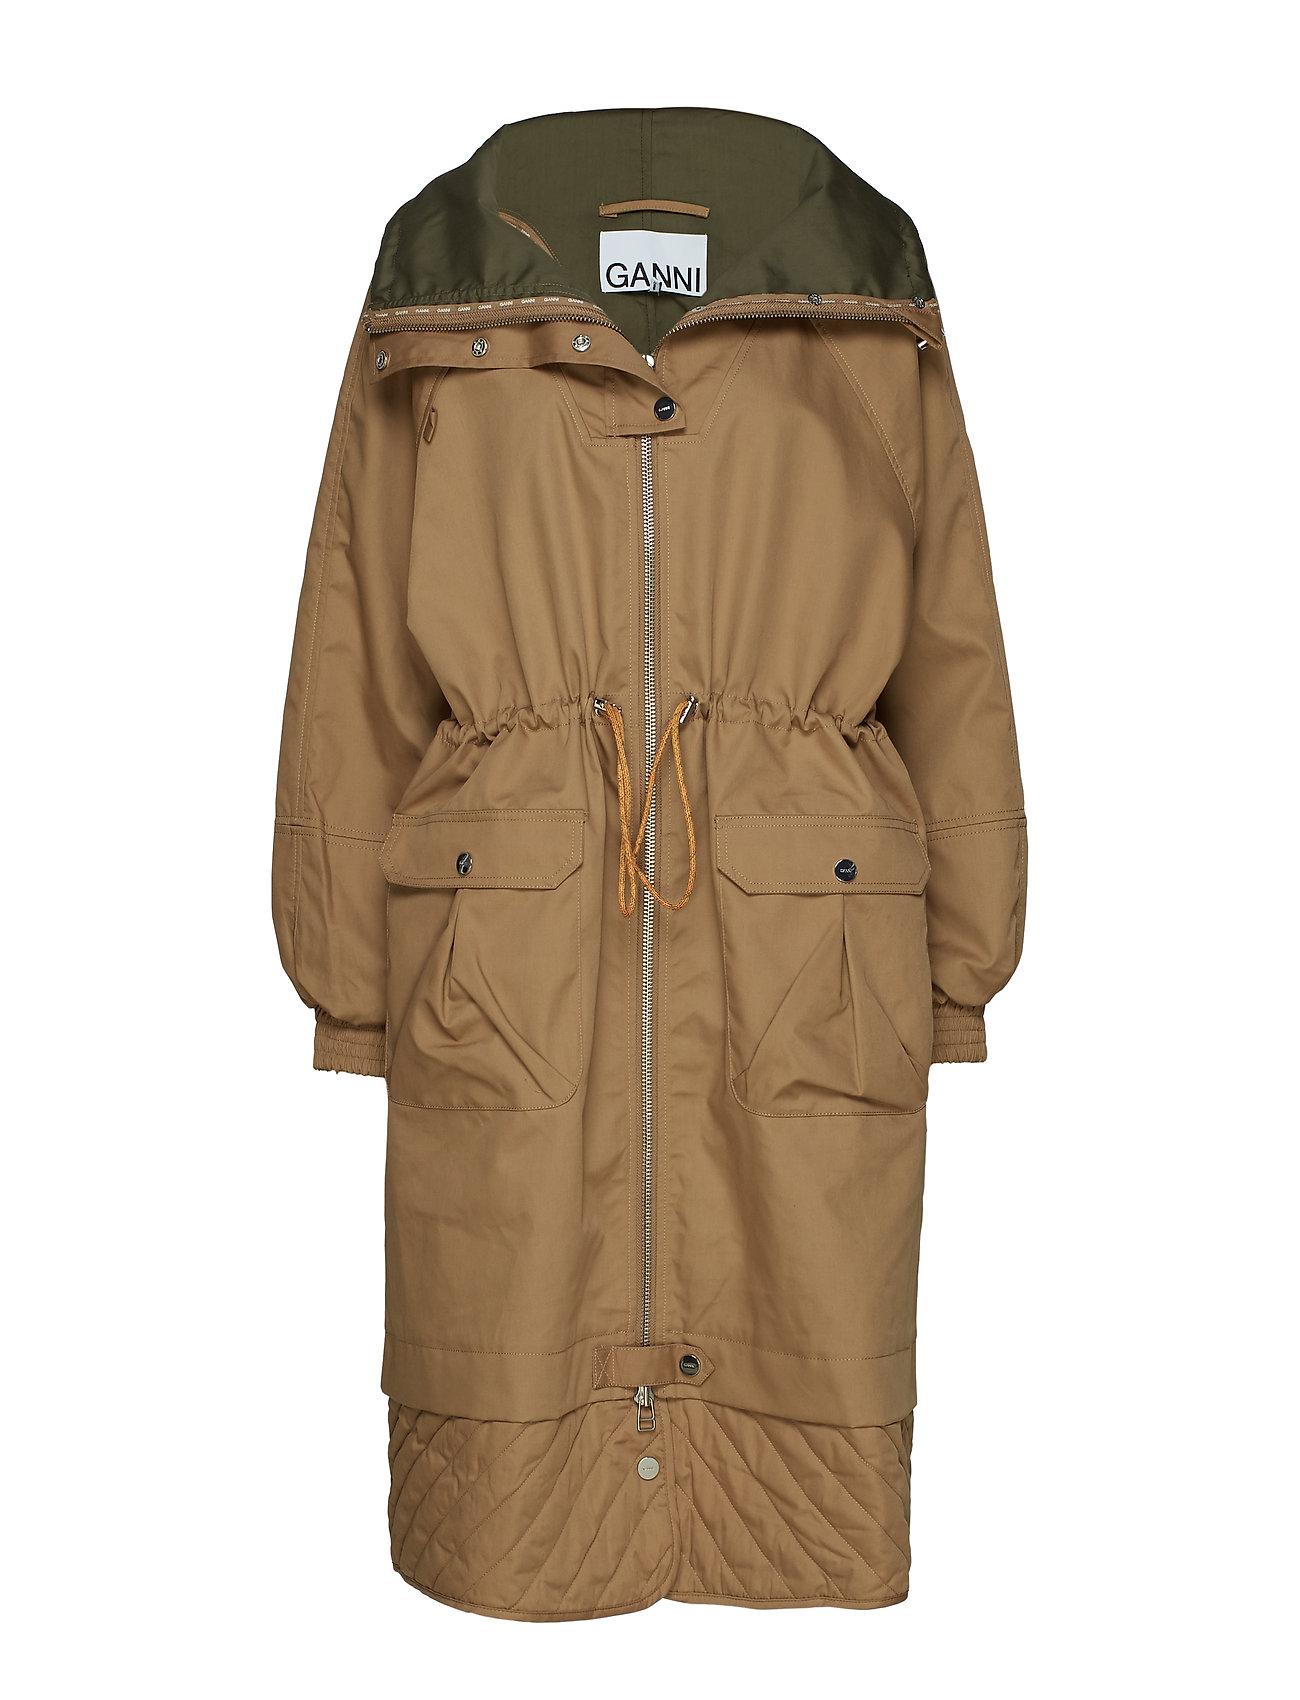 Ganni Double Cotton Jacket - TIGER'S EYE